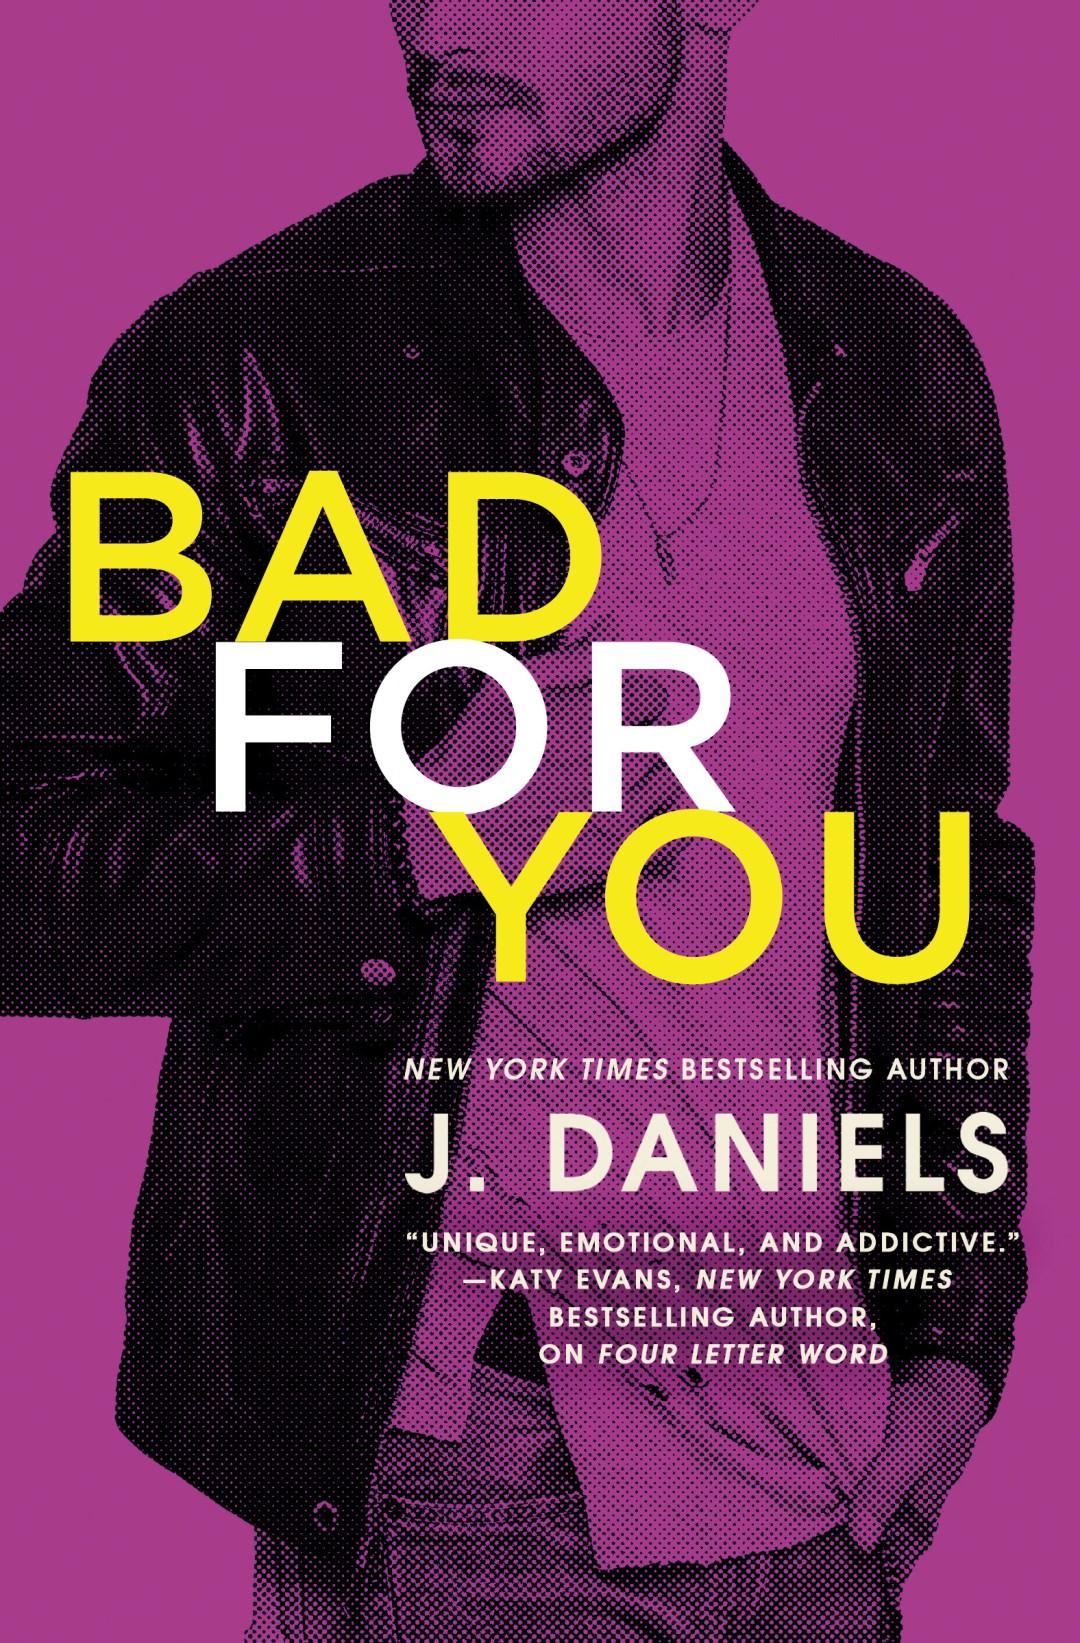 bad-for-you-cover-art-jdaniels